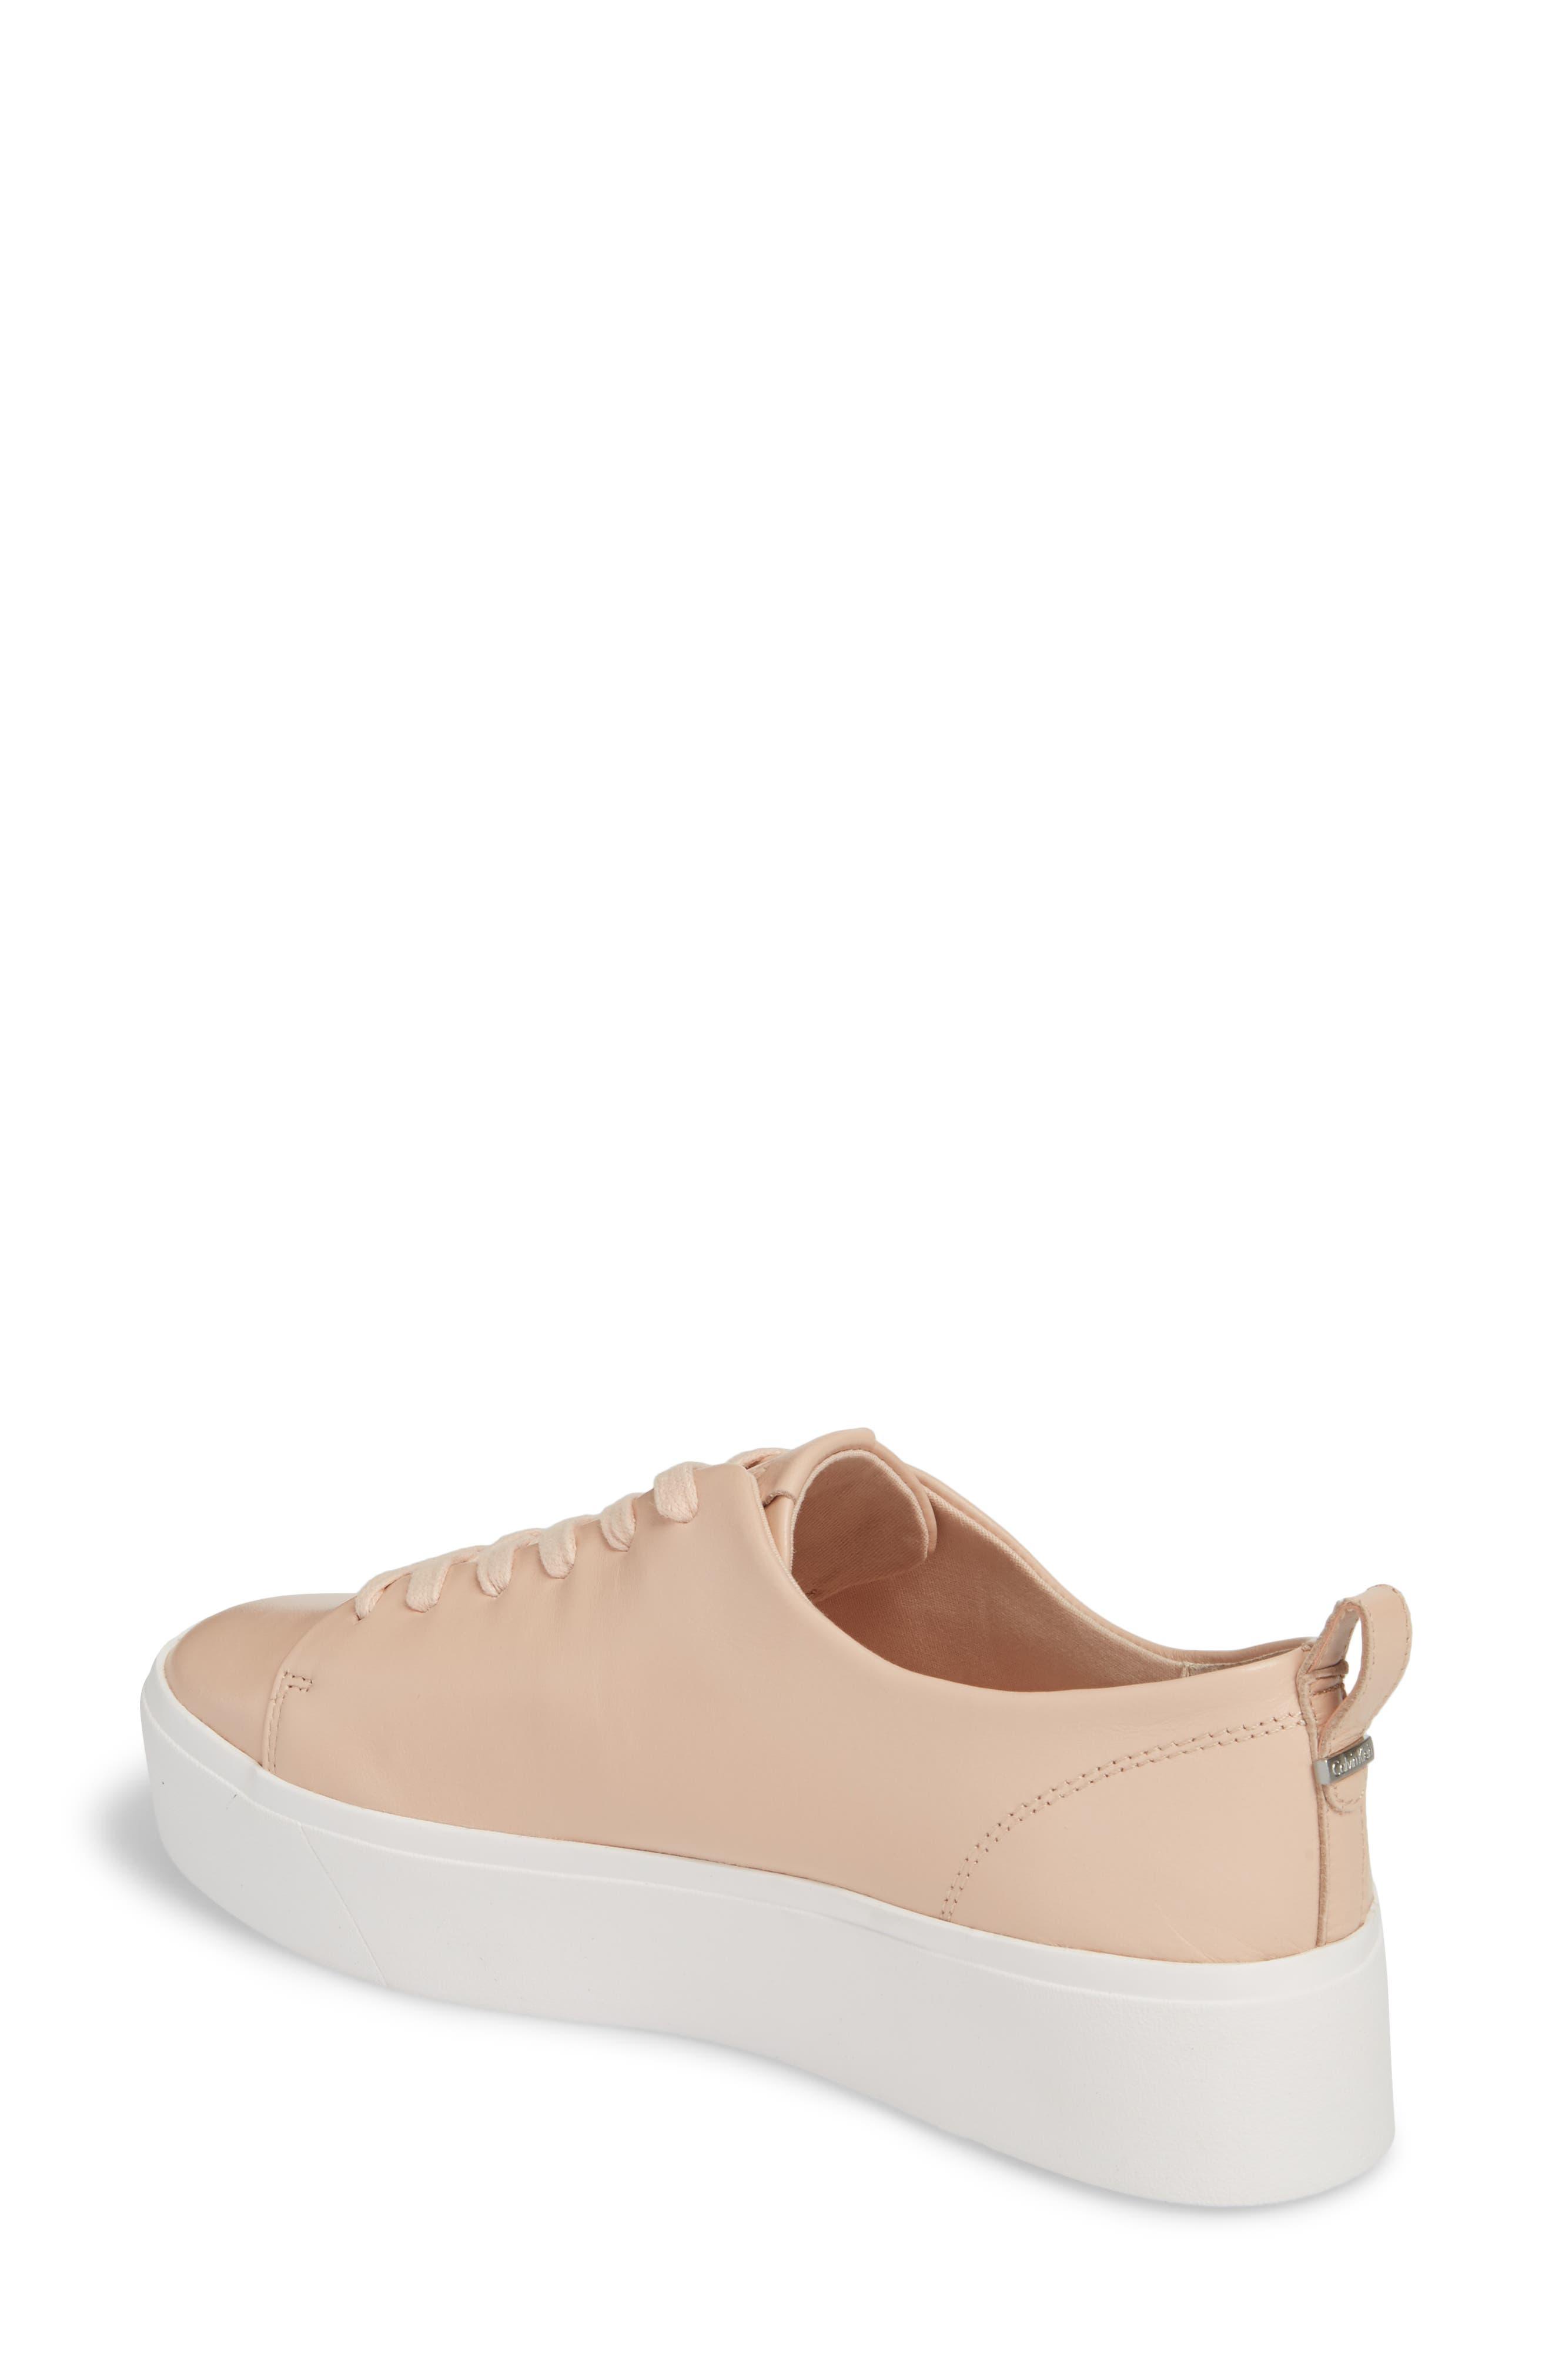 Janet Platform Sneaker,                             Alternate thumbnail 2, color,                             Pink Leather